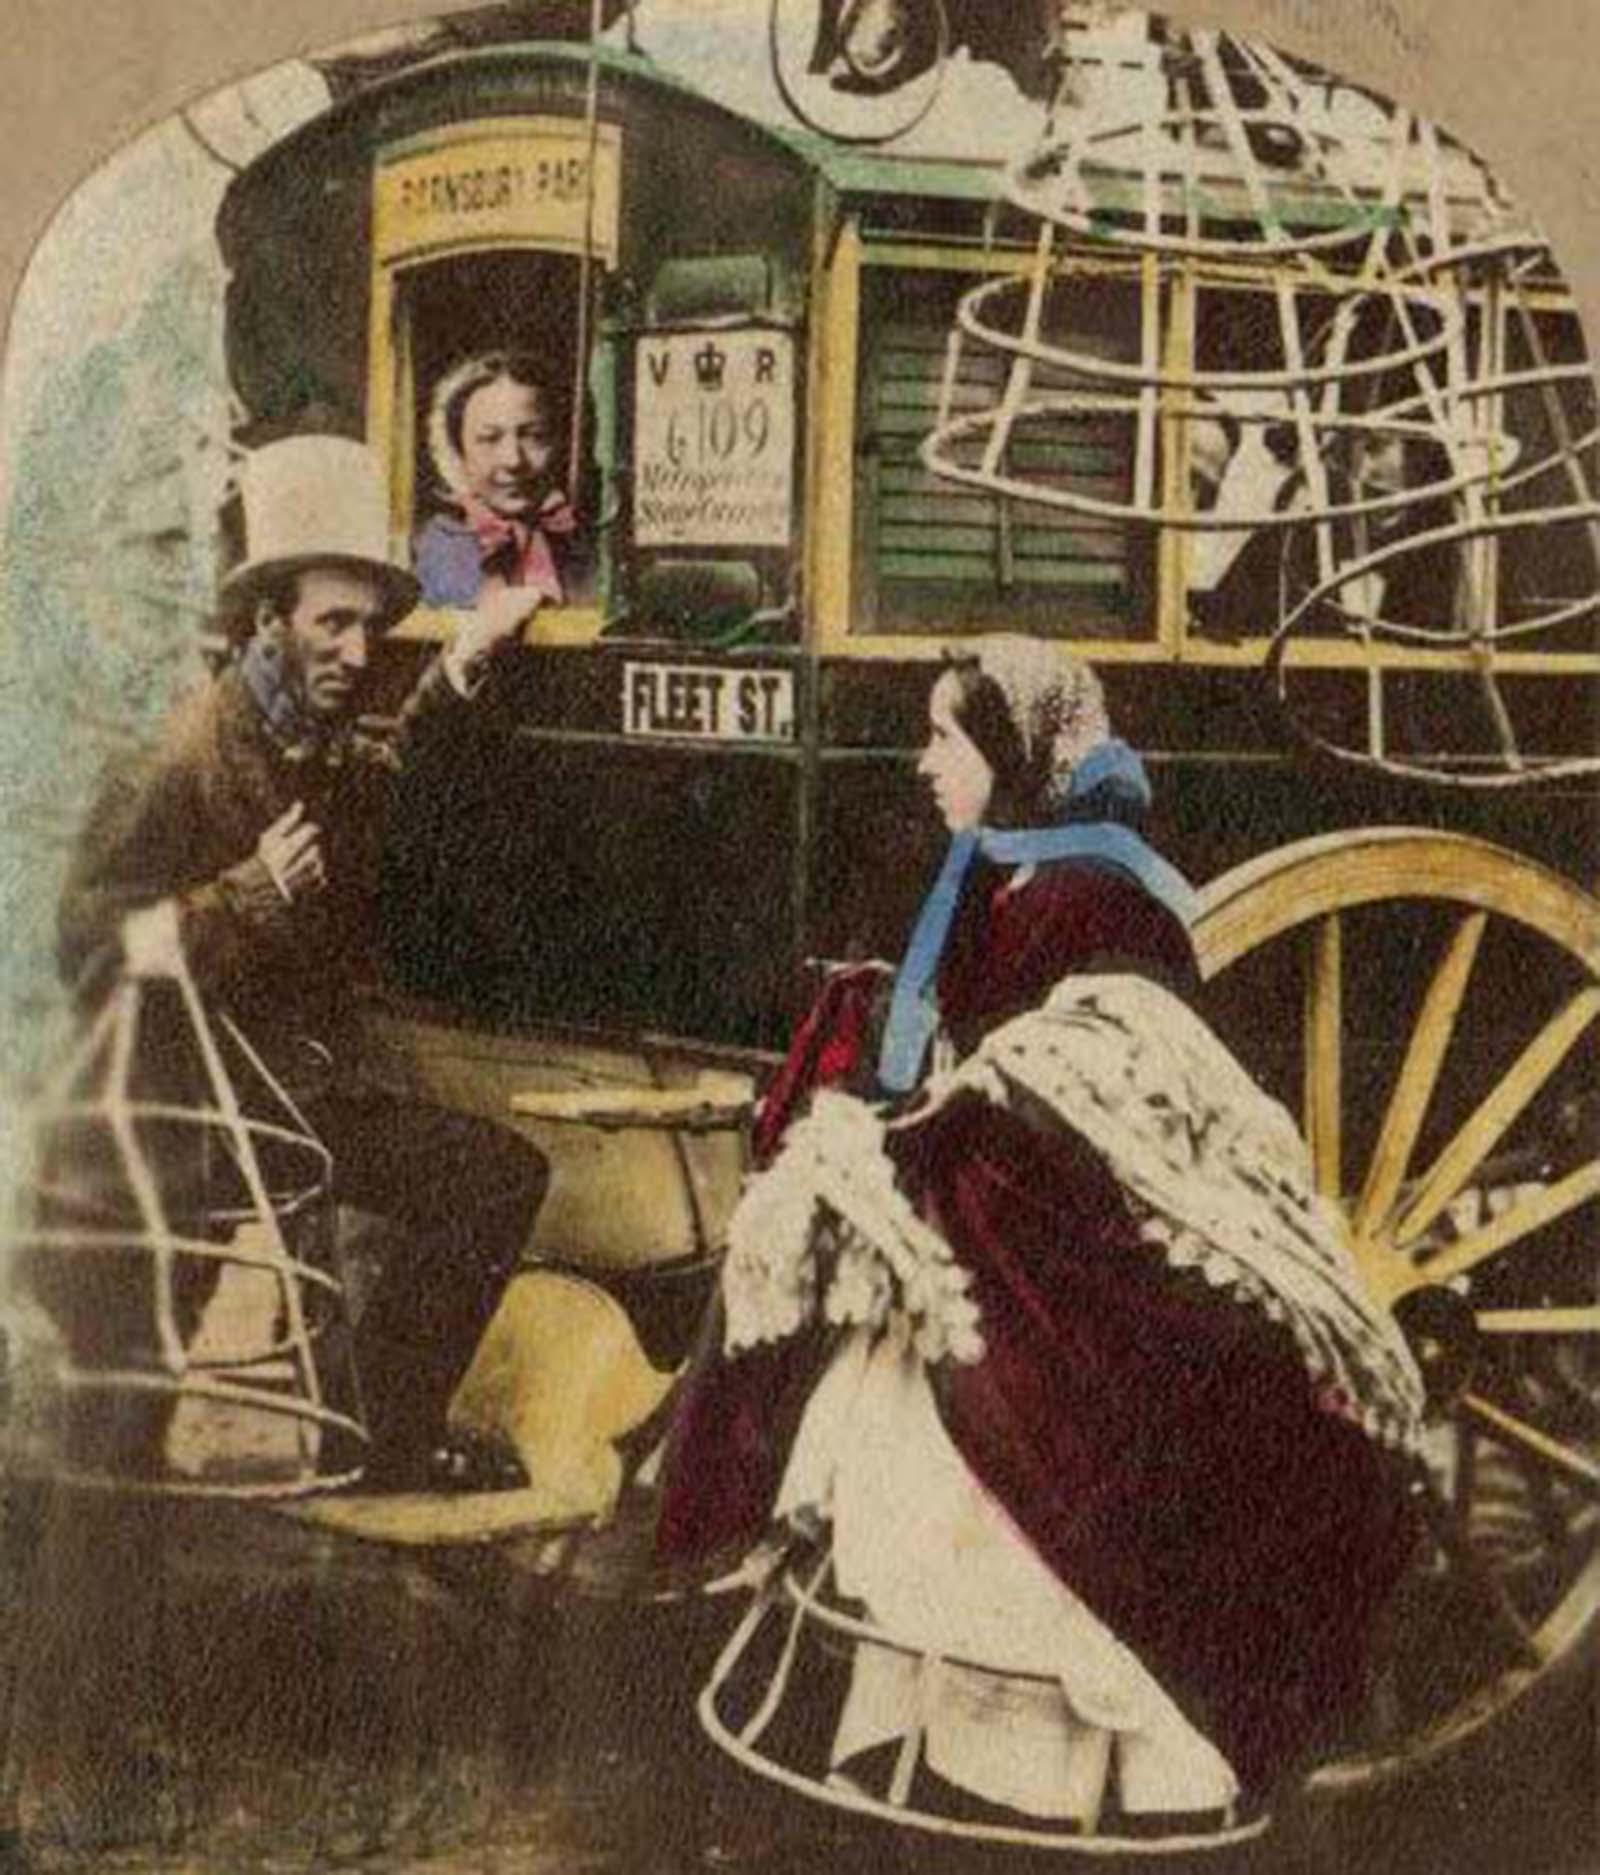 crinoline historical photos